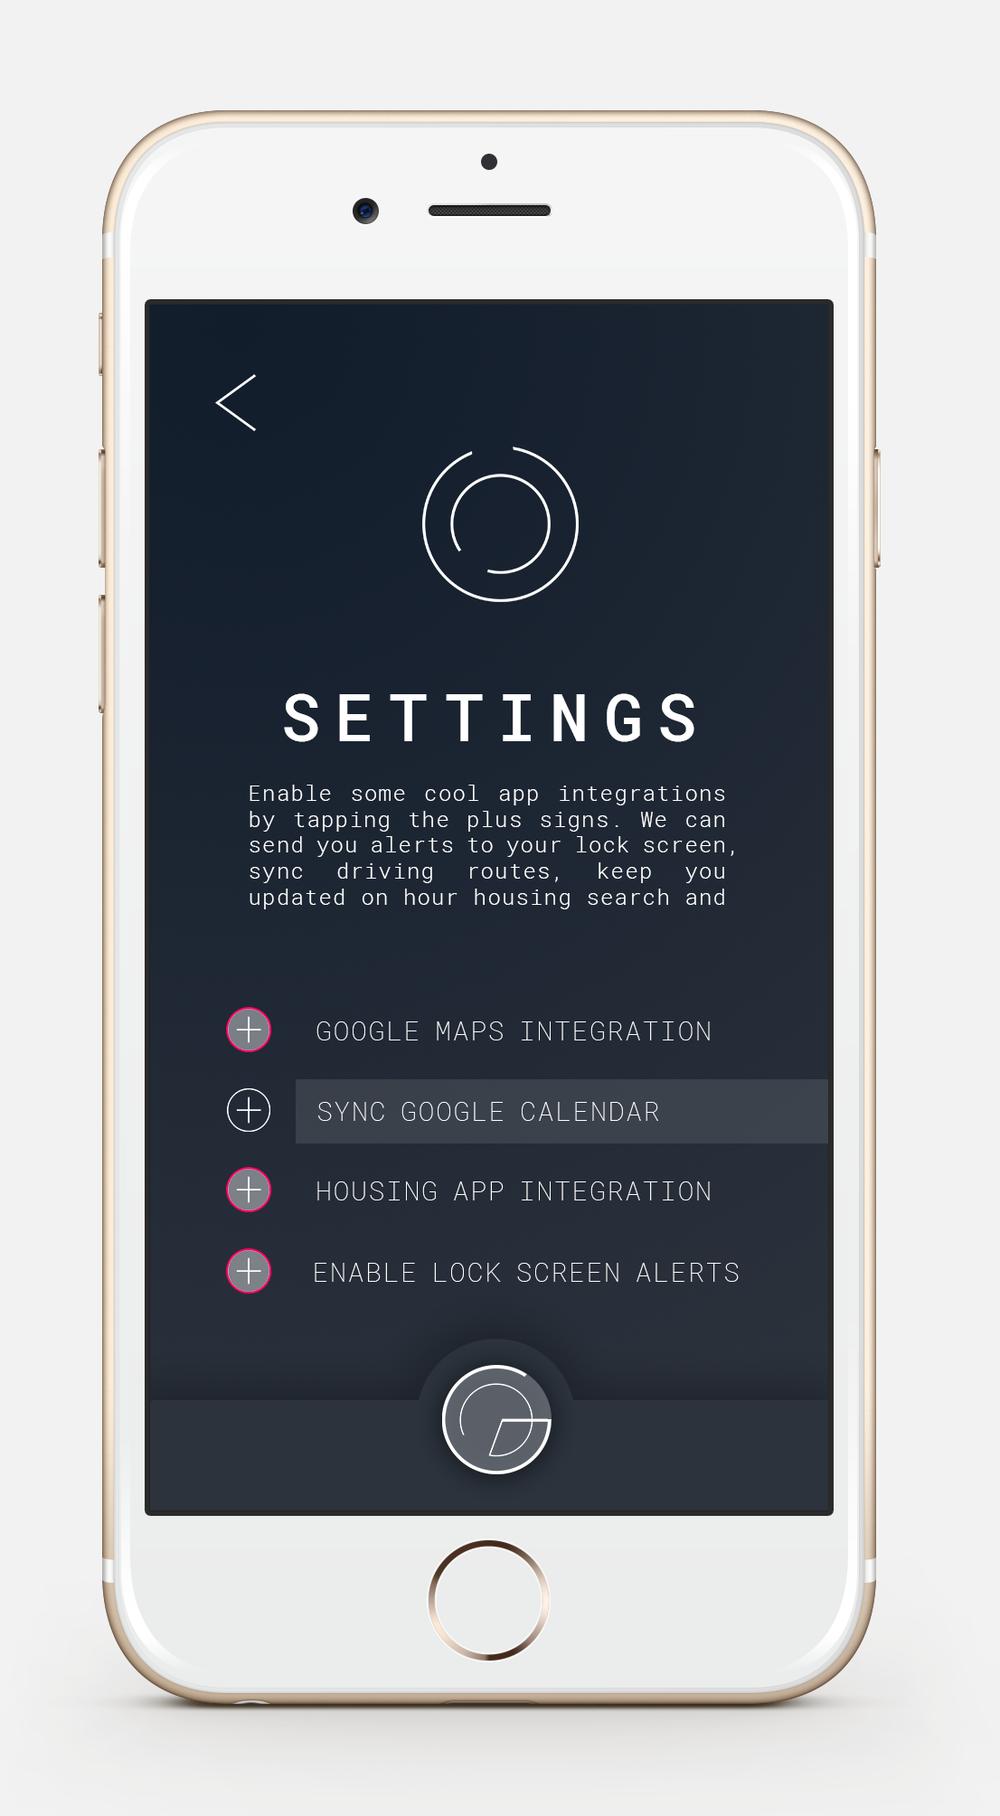 agile-settings-nav-inactive.png